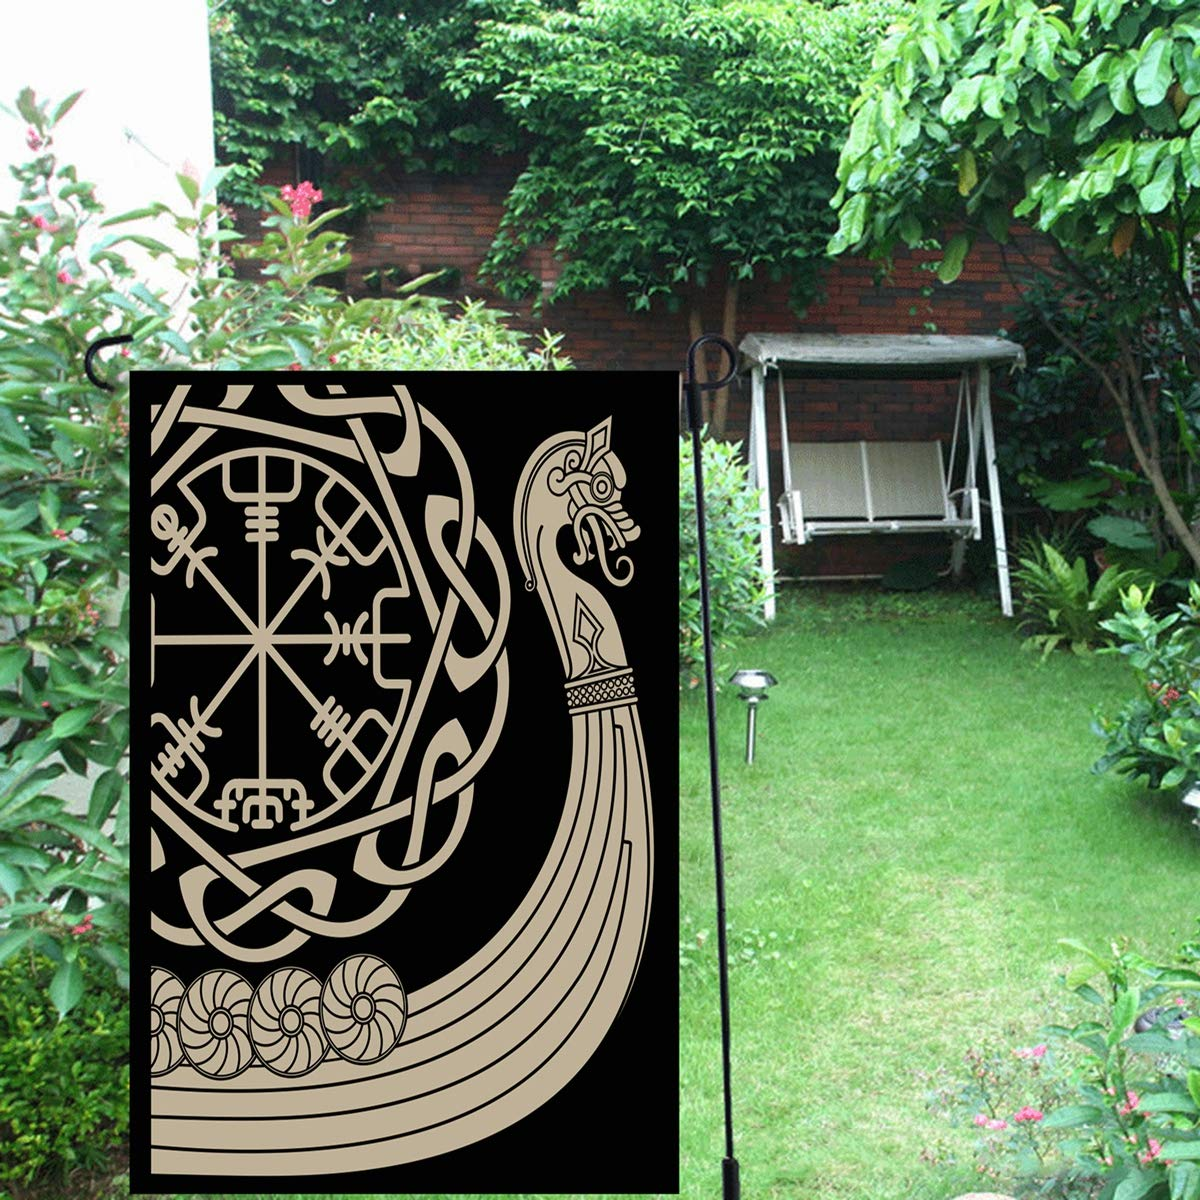 Amazon.com: Ahawoso - Bandera de jardín para exteriores ...